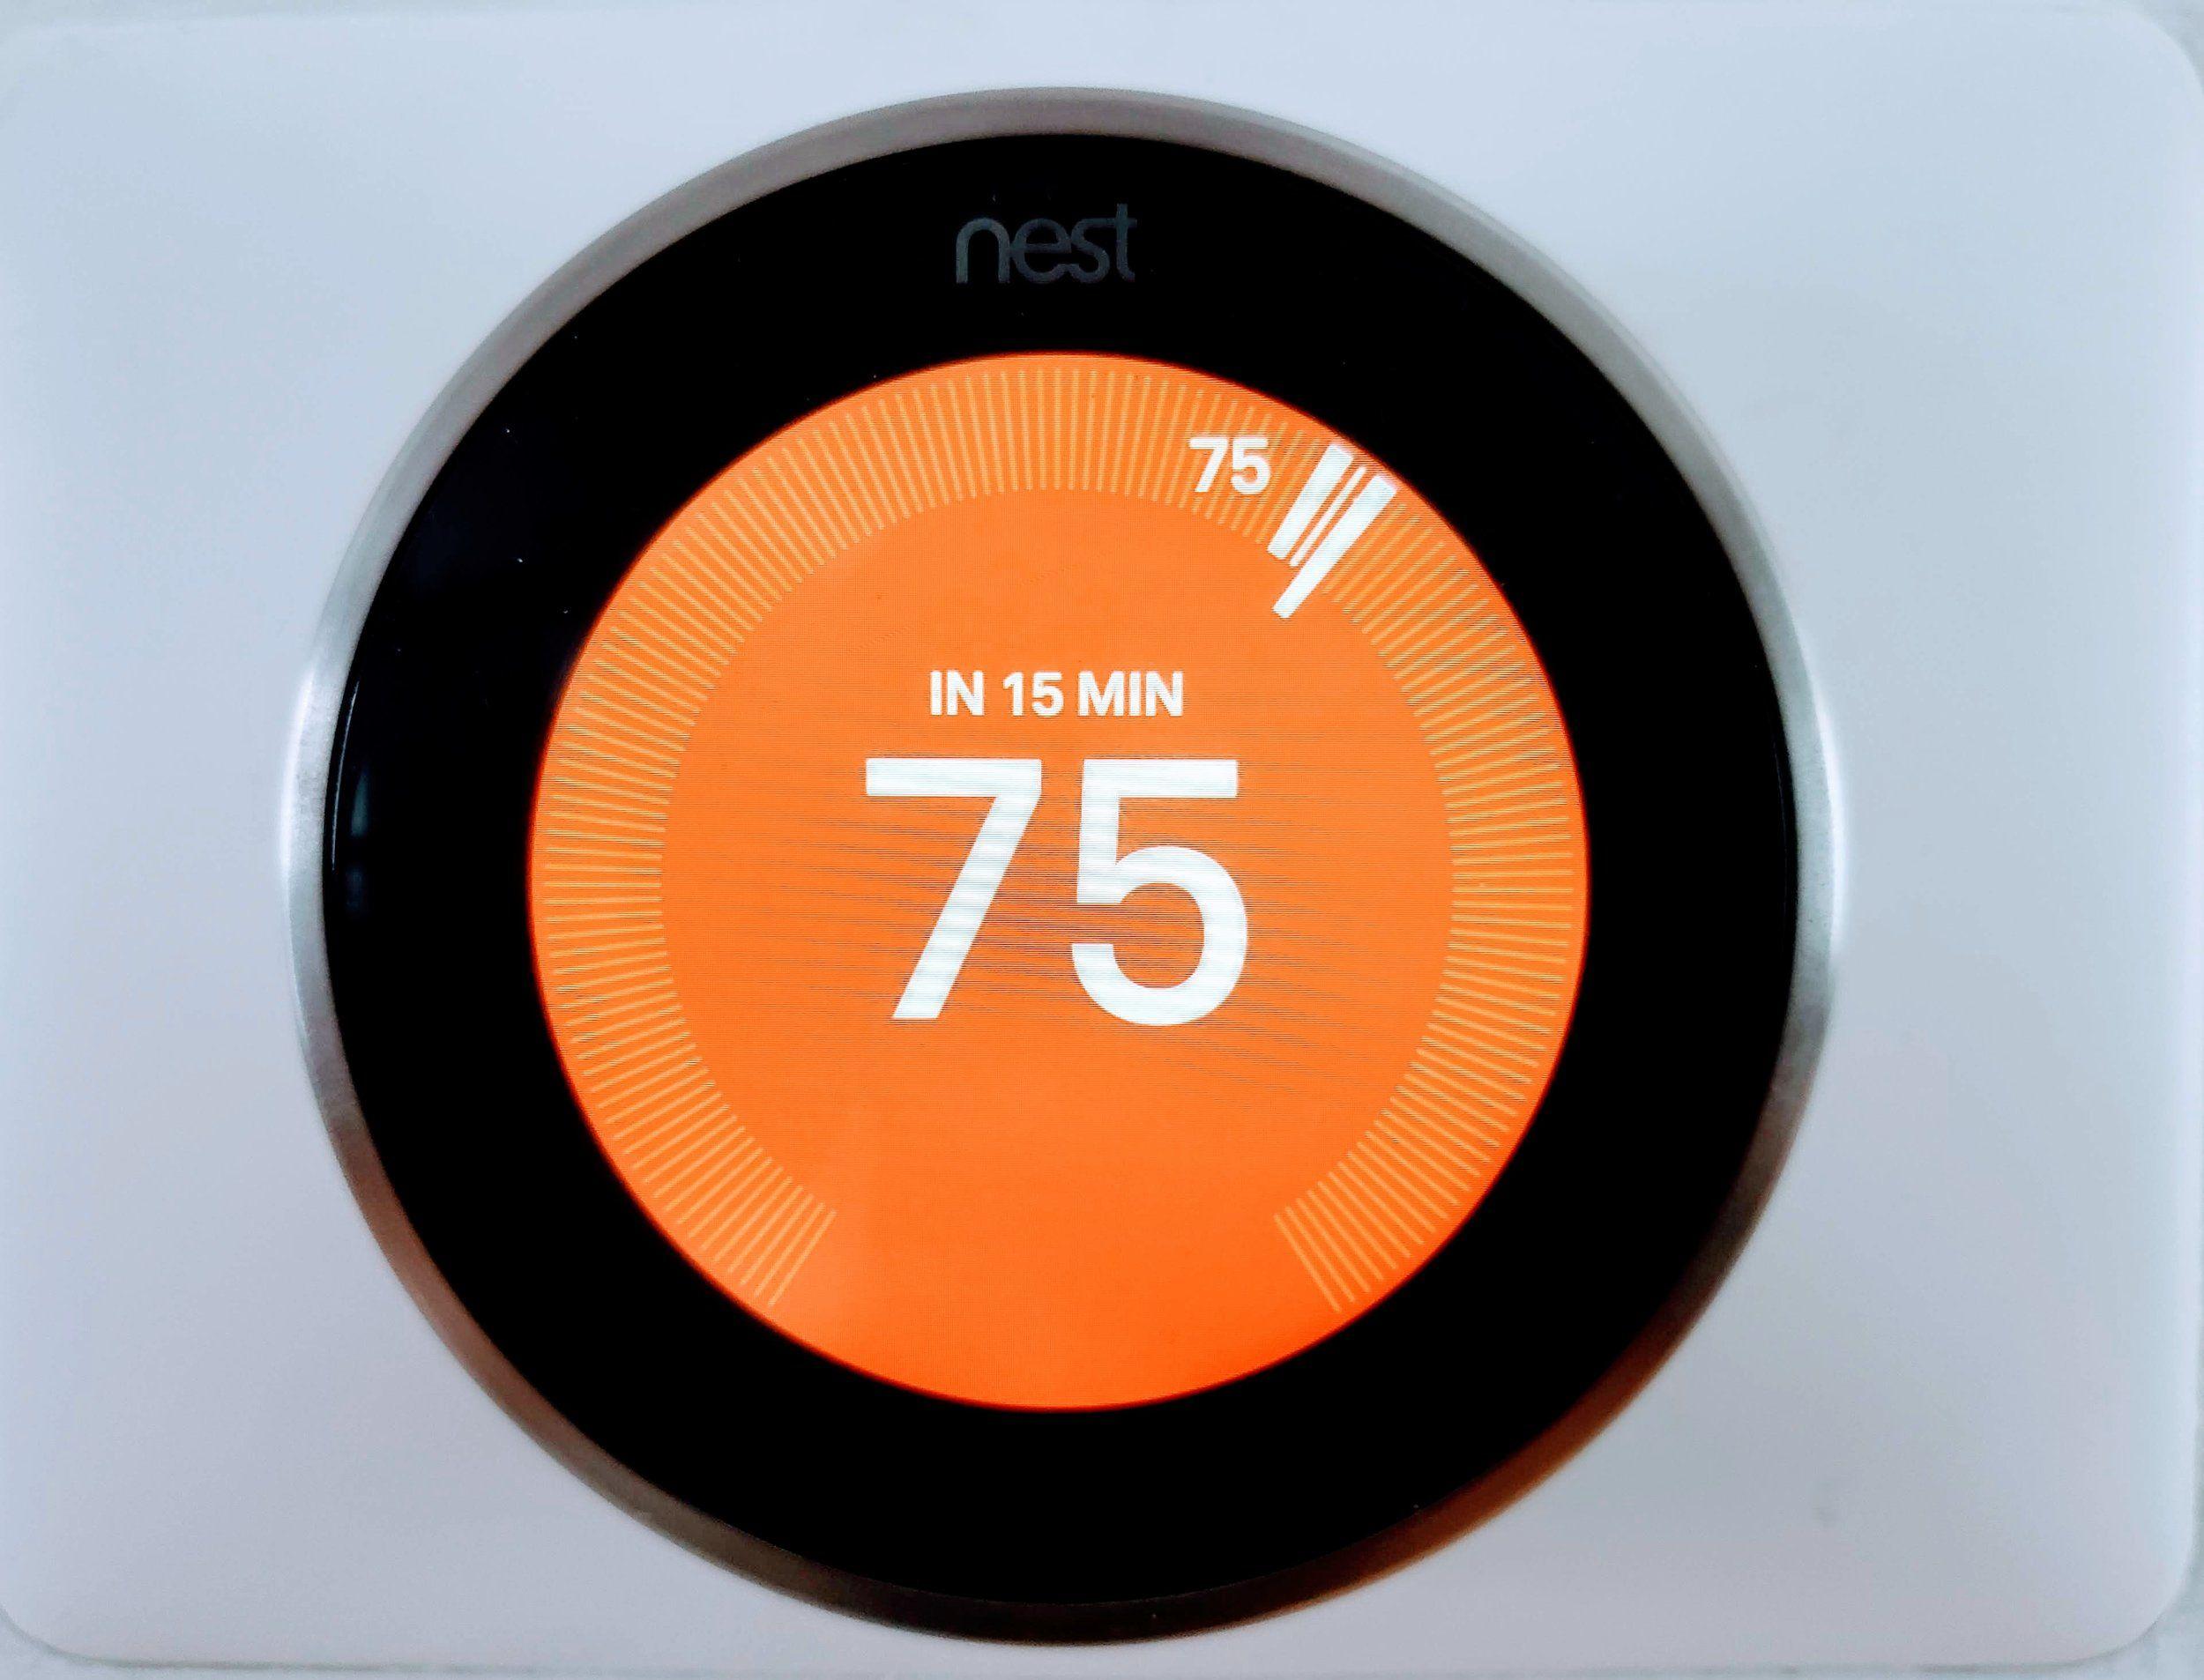 Nest Thermostat Battery Thermostat, Nest thermostat, Nest